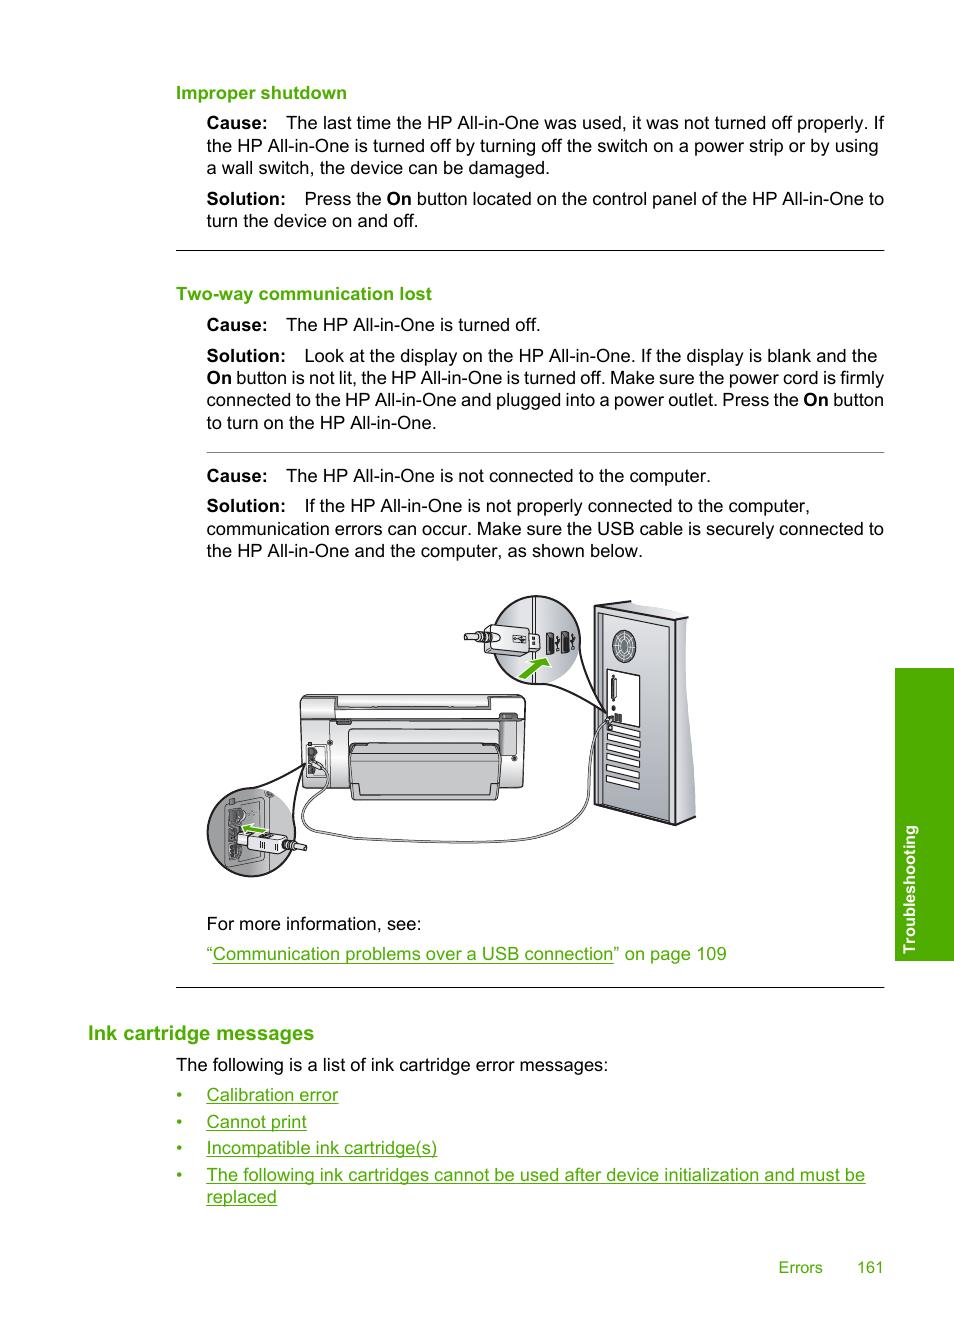 ink cartridge messages improper shutdown two way communication rh manualsdir com hp photosmart c6280 notice hp photosmart c6280 manual pdf